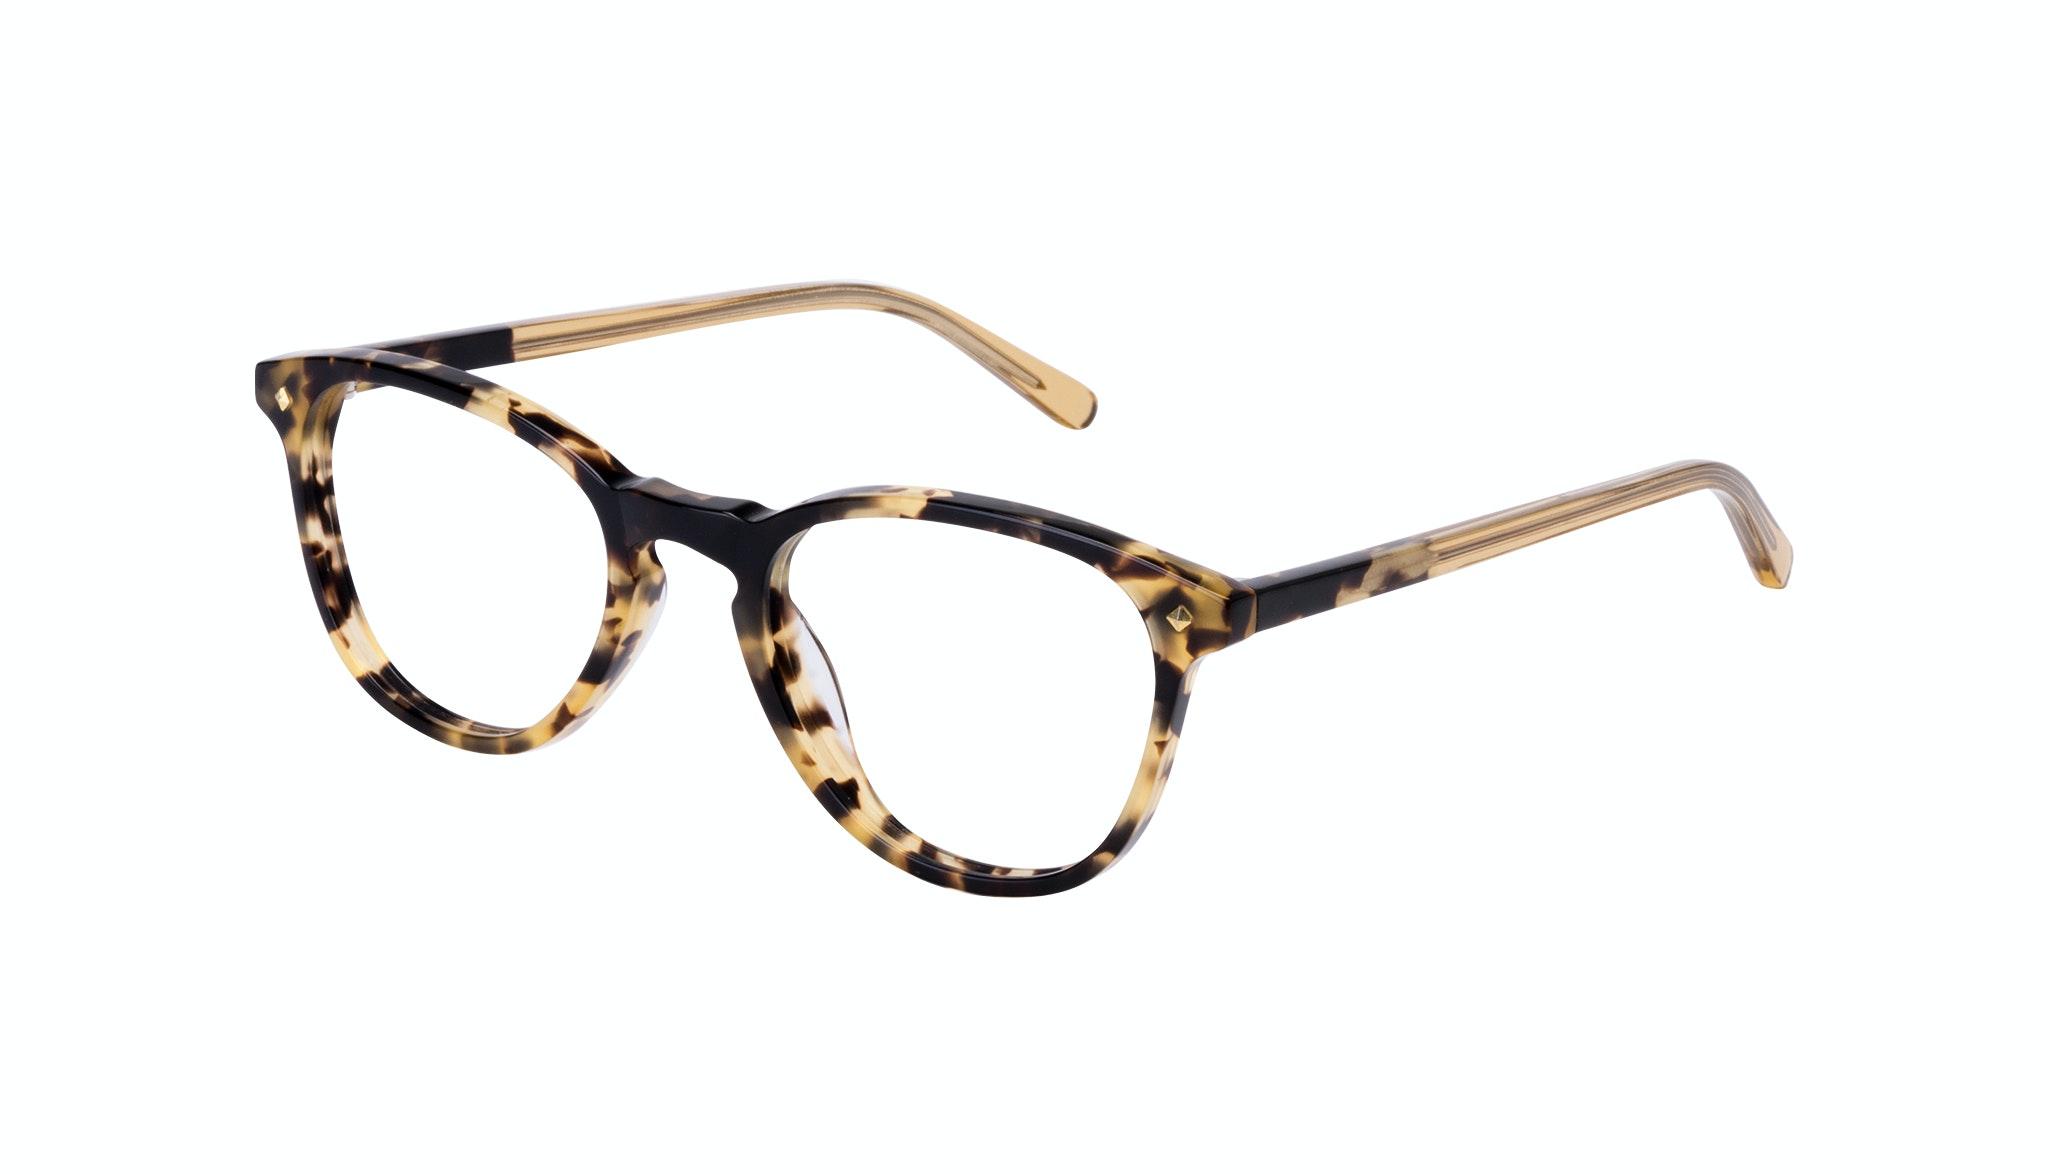 Affordable Fashion Glasses Round Eyeglasses Women Crush Bingal Tilt